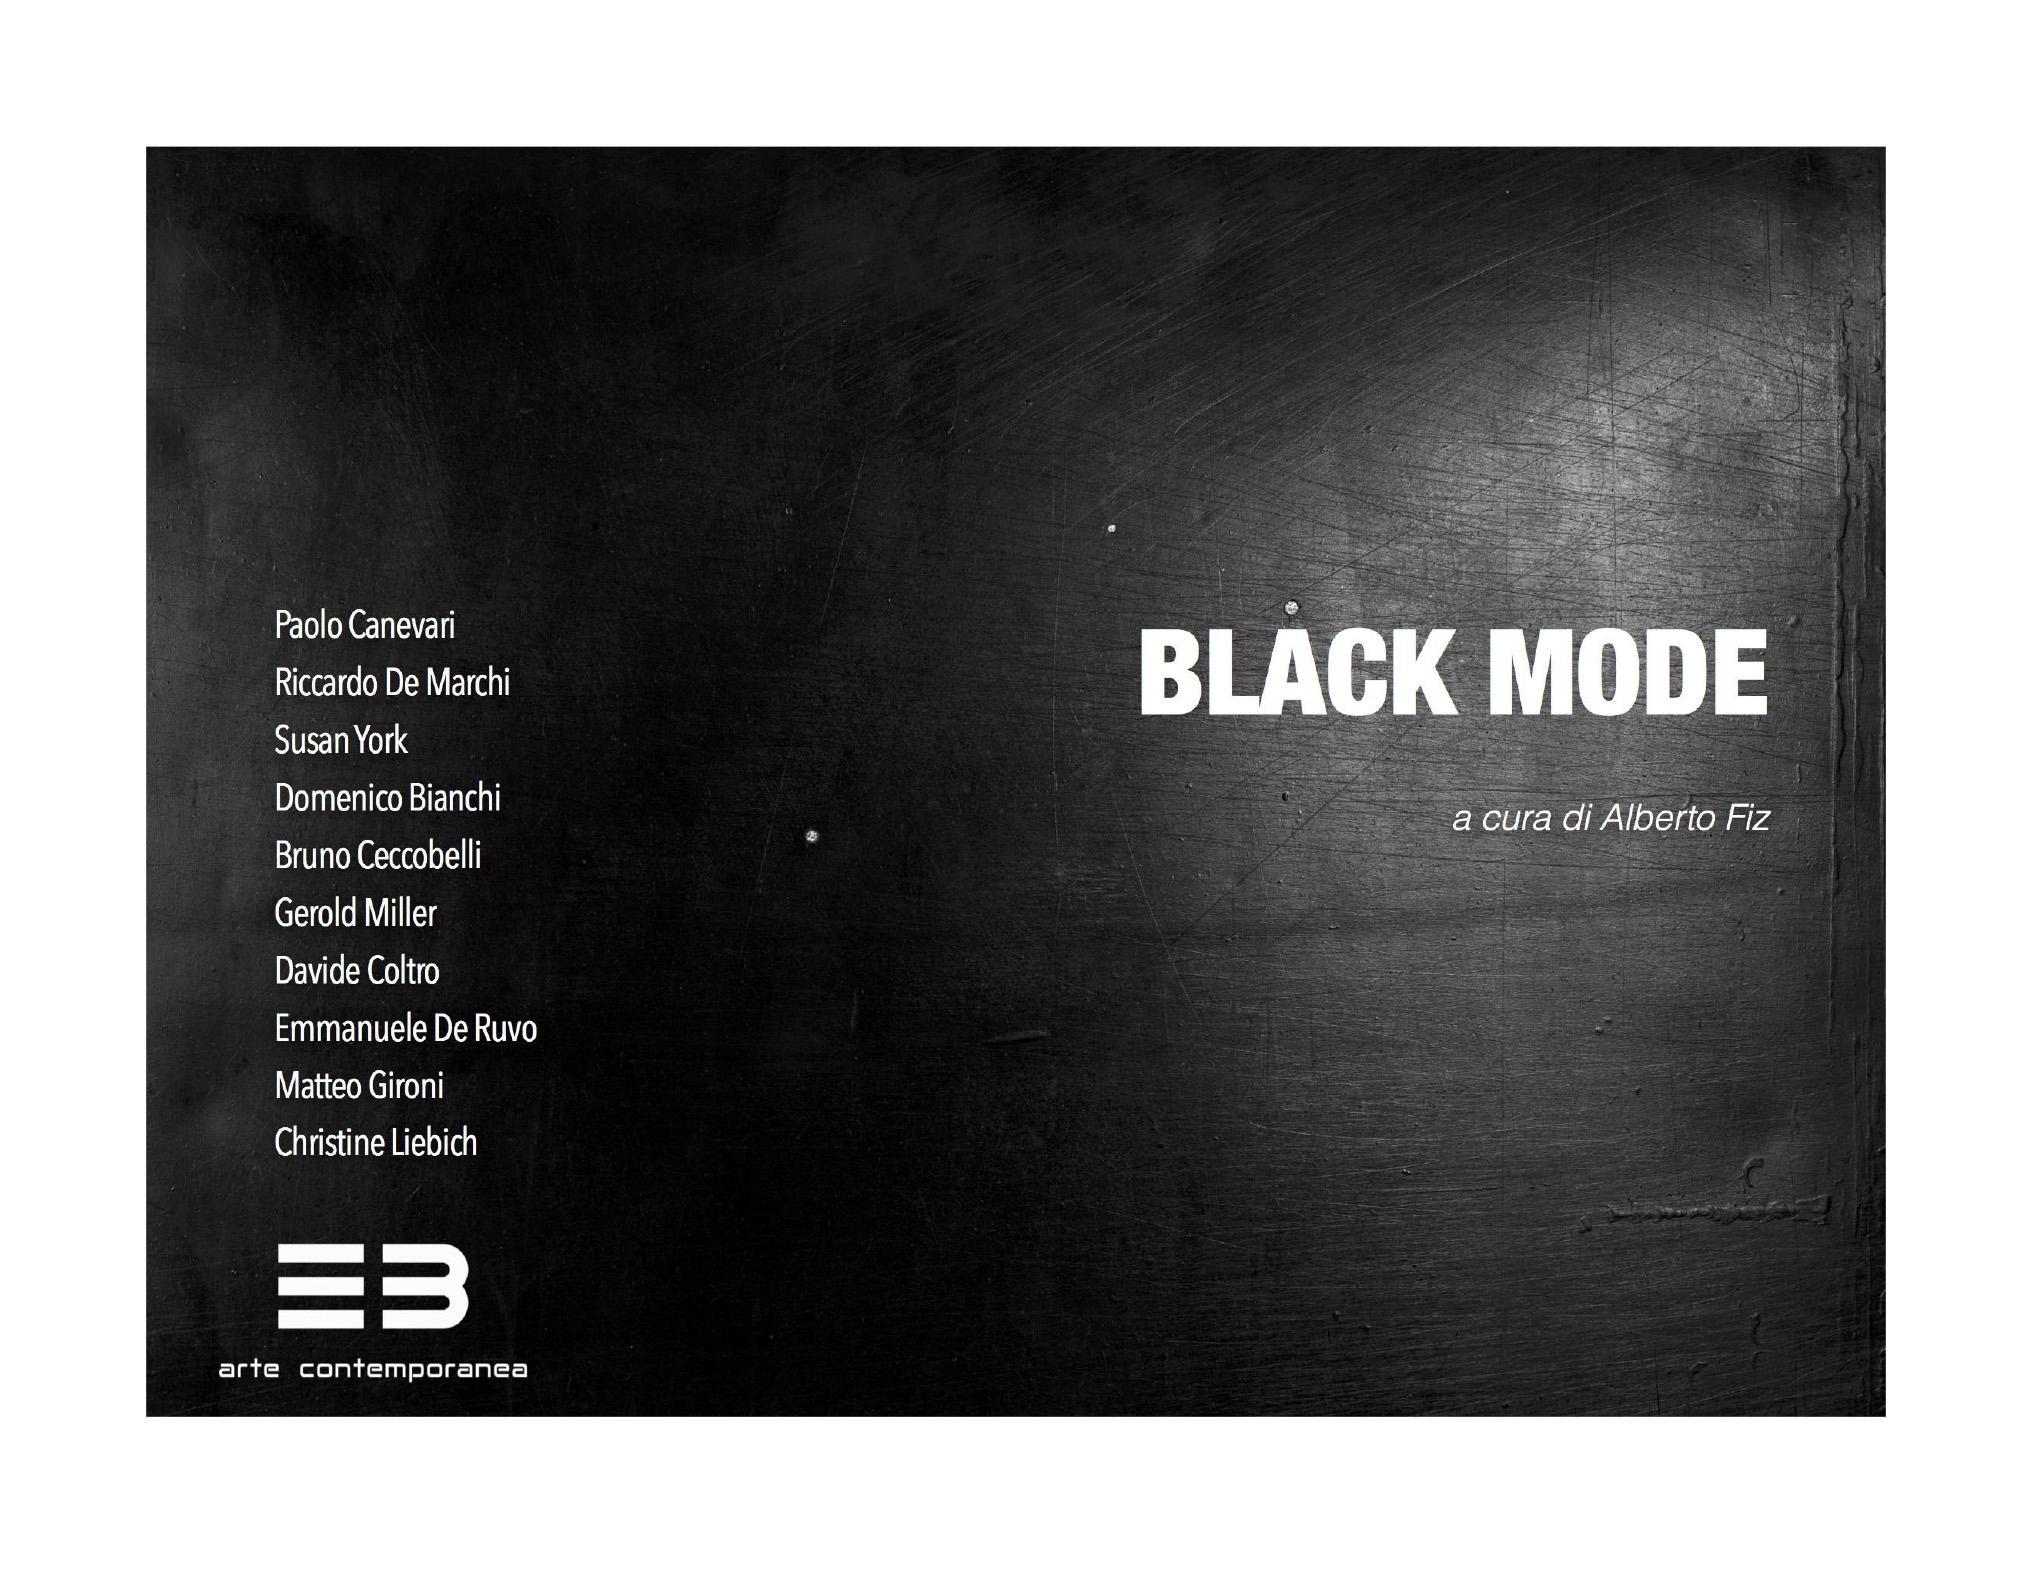 BLACK MODE